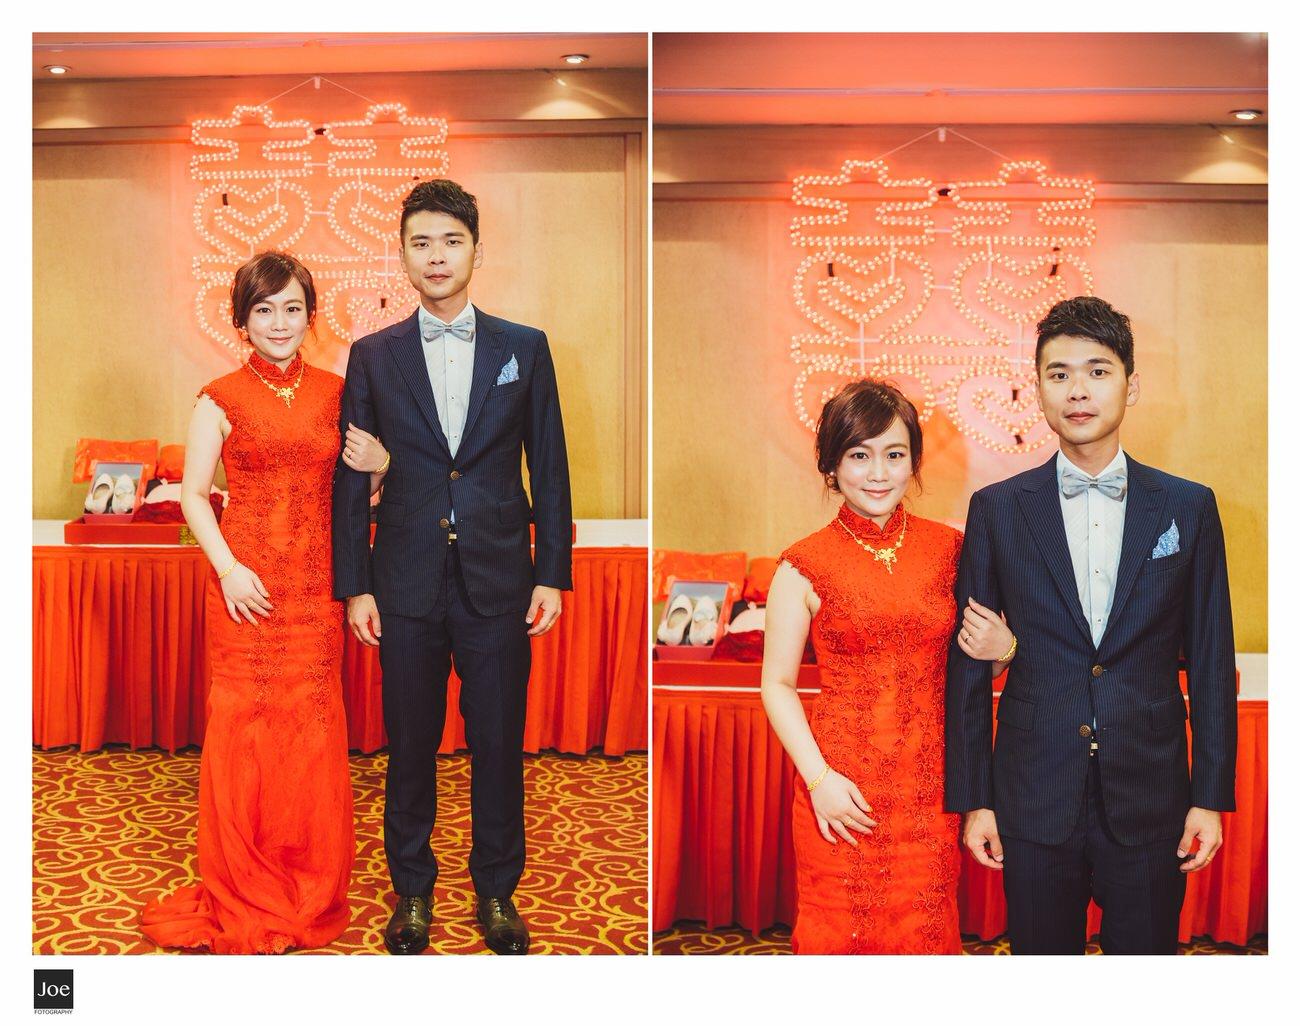 sunworld-dynasty-hotel-taipei-wedding-photo-joe-fotography-angel-jay-023.jpg